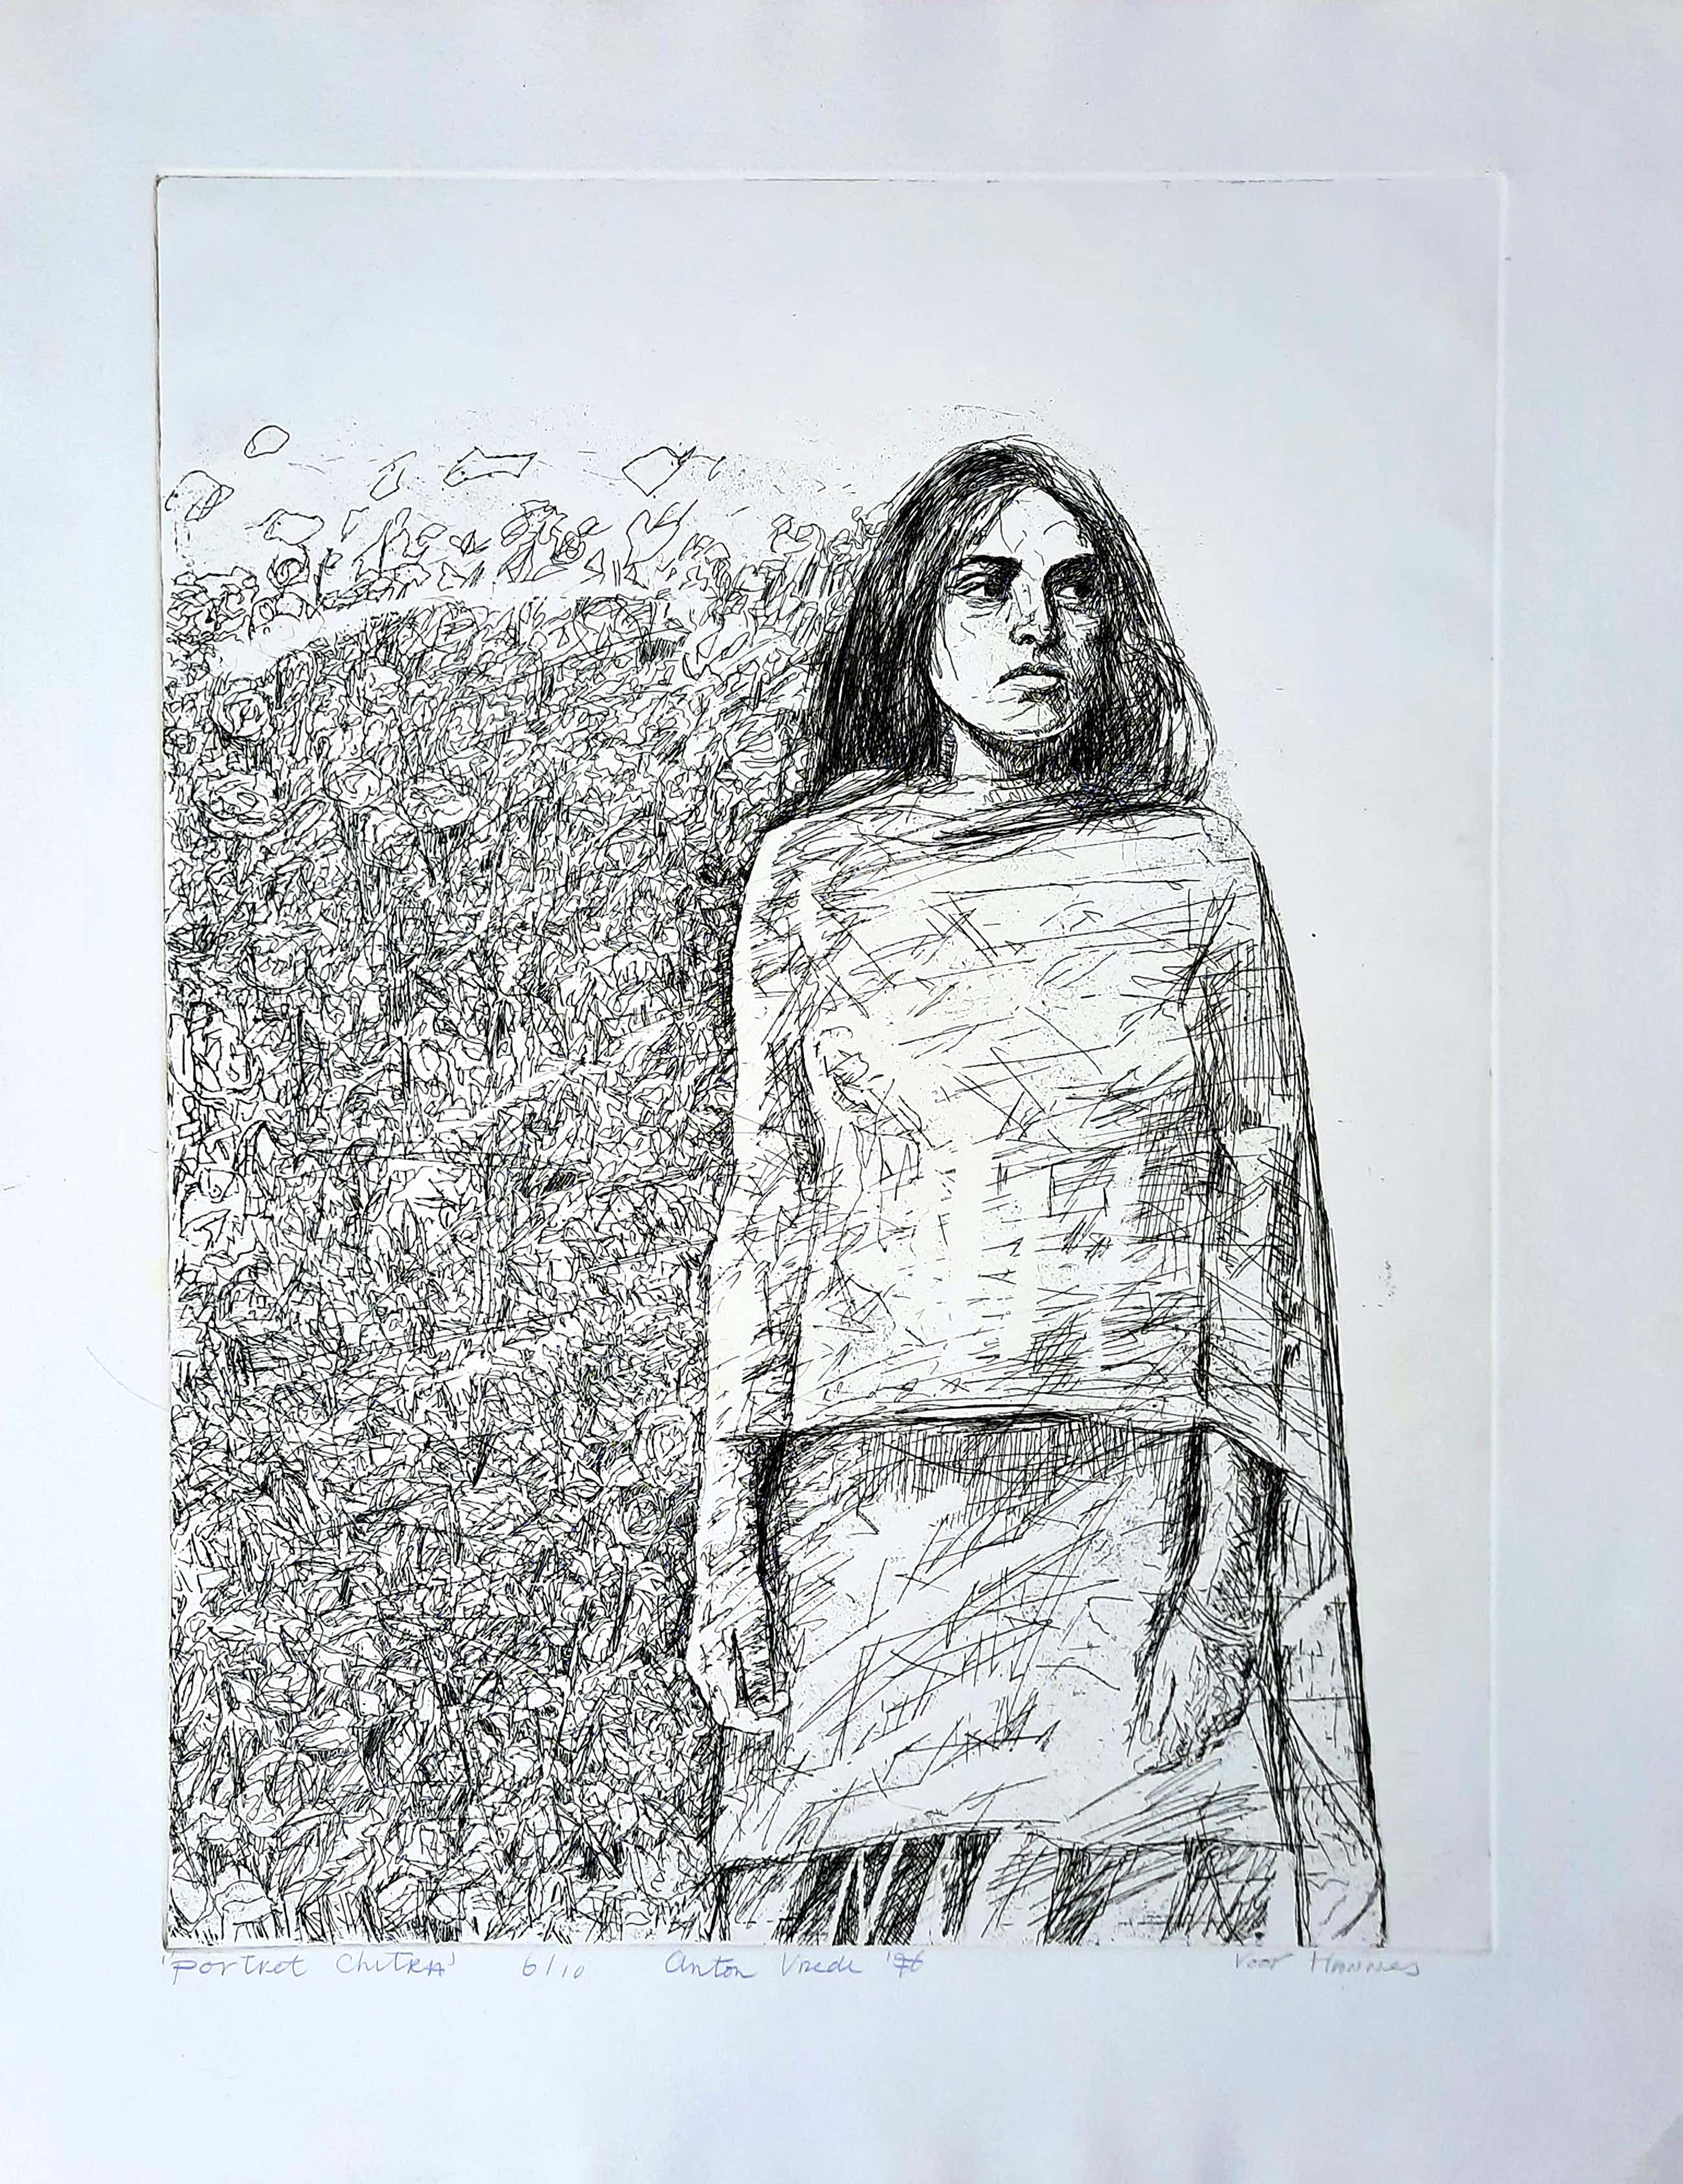 Anton Vrede - drogenaald ETS - Portret Chitra 6/10 - vroeg werk 1976 kopen? Bied vanaf 65!